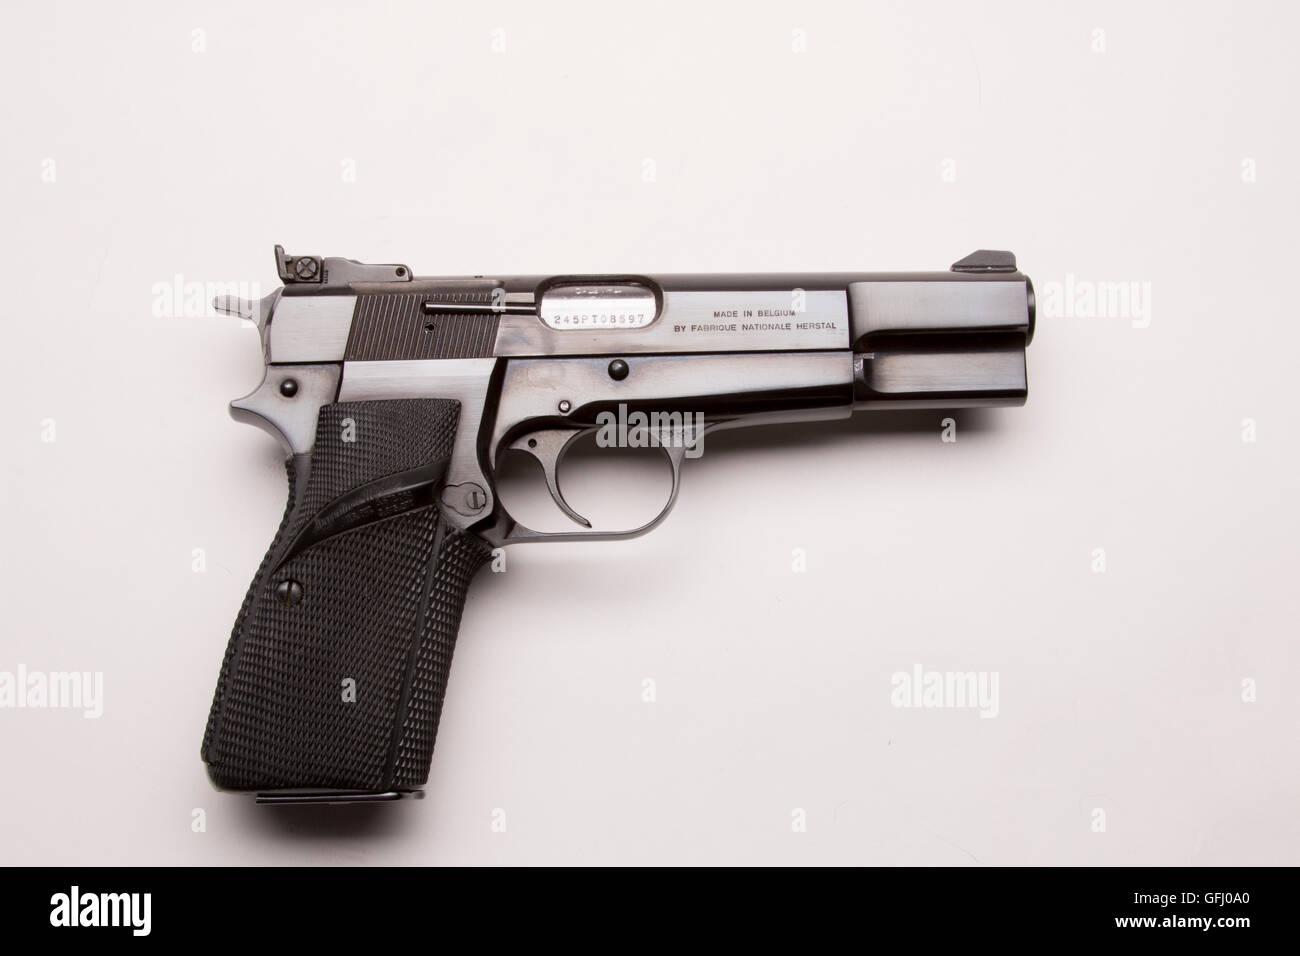 9mm Pistol Stock Photos & 9mm Pistol Stock Images - Alamy